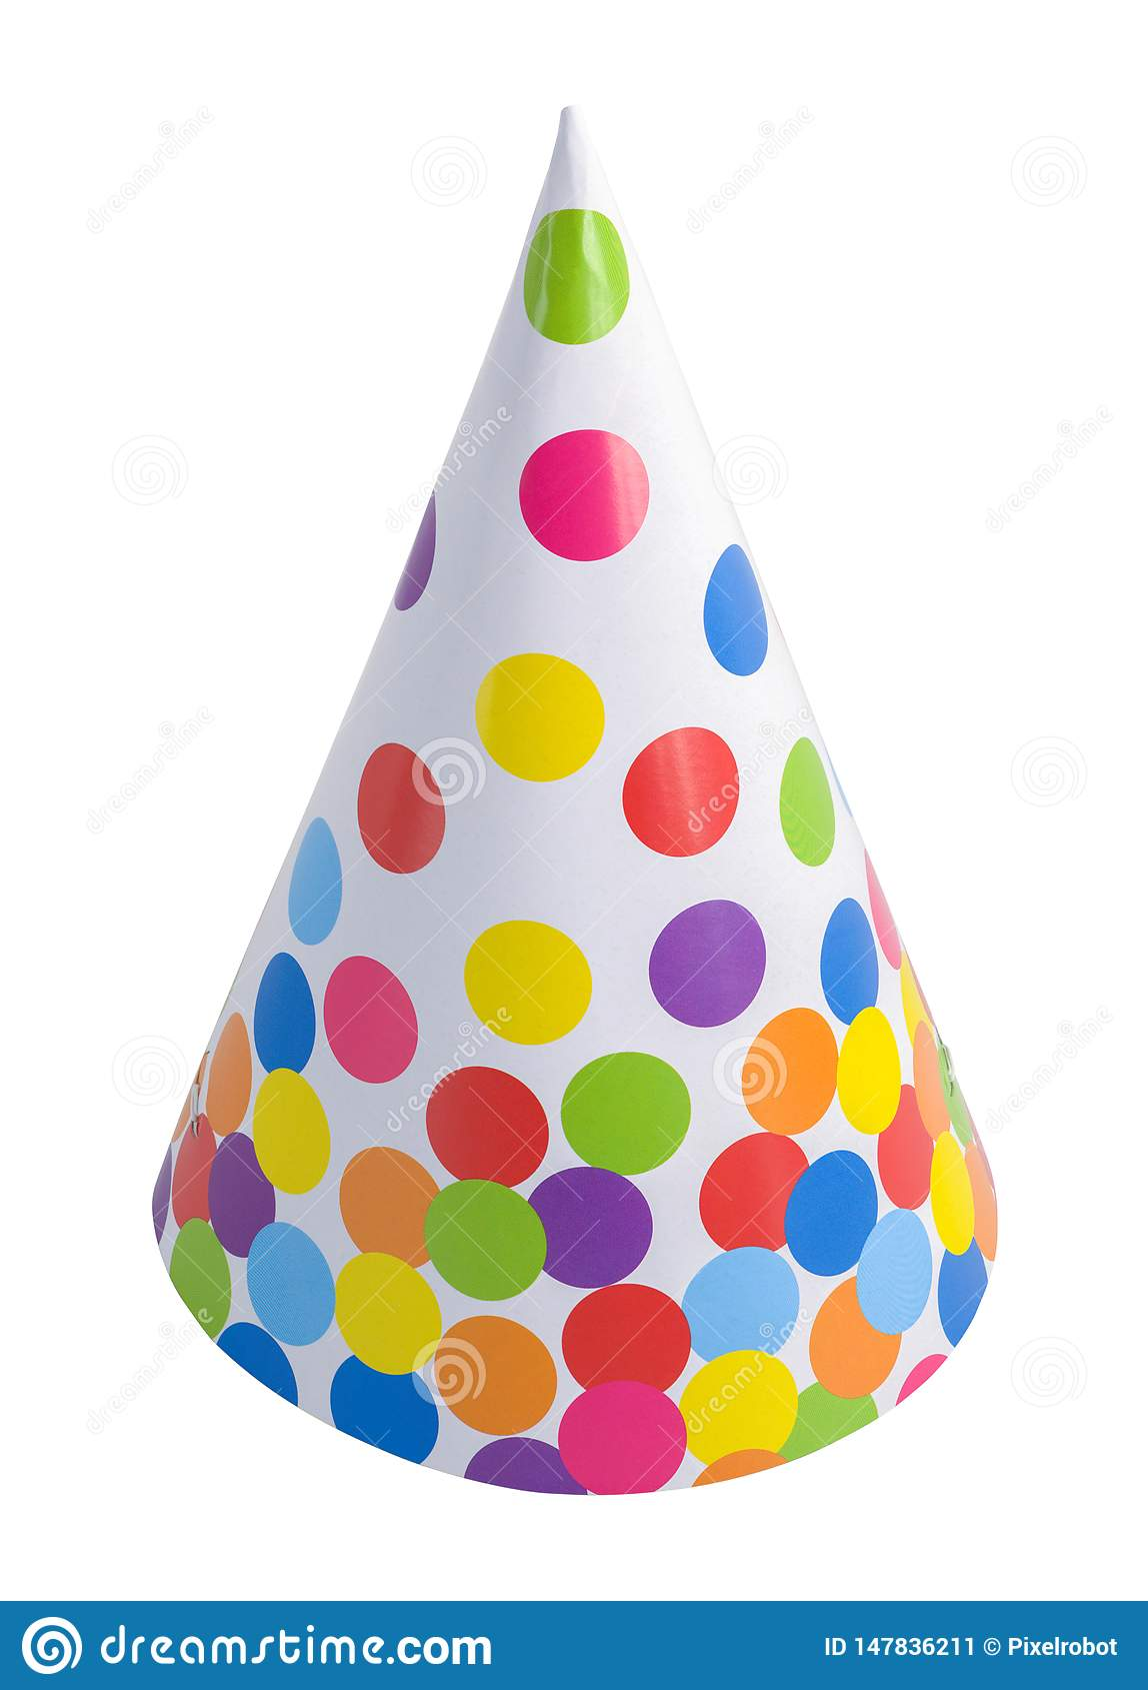 Polka Dot Party Hat